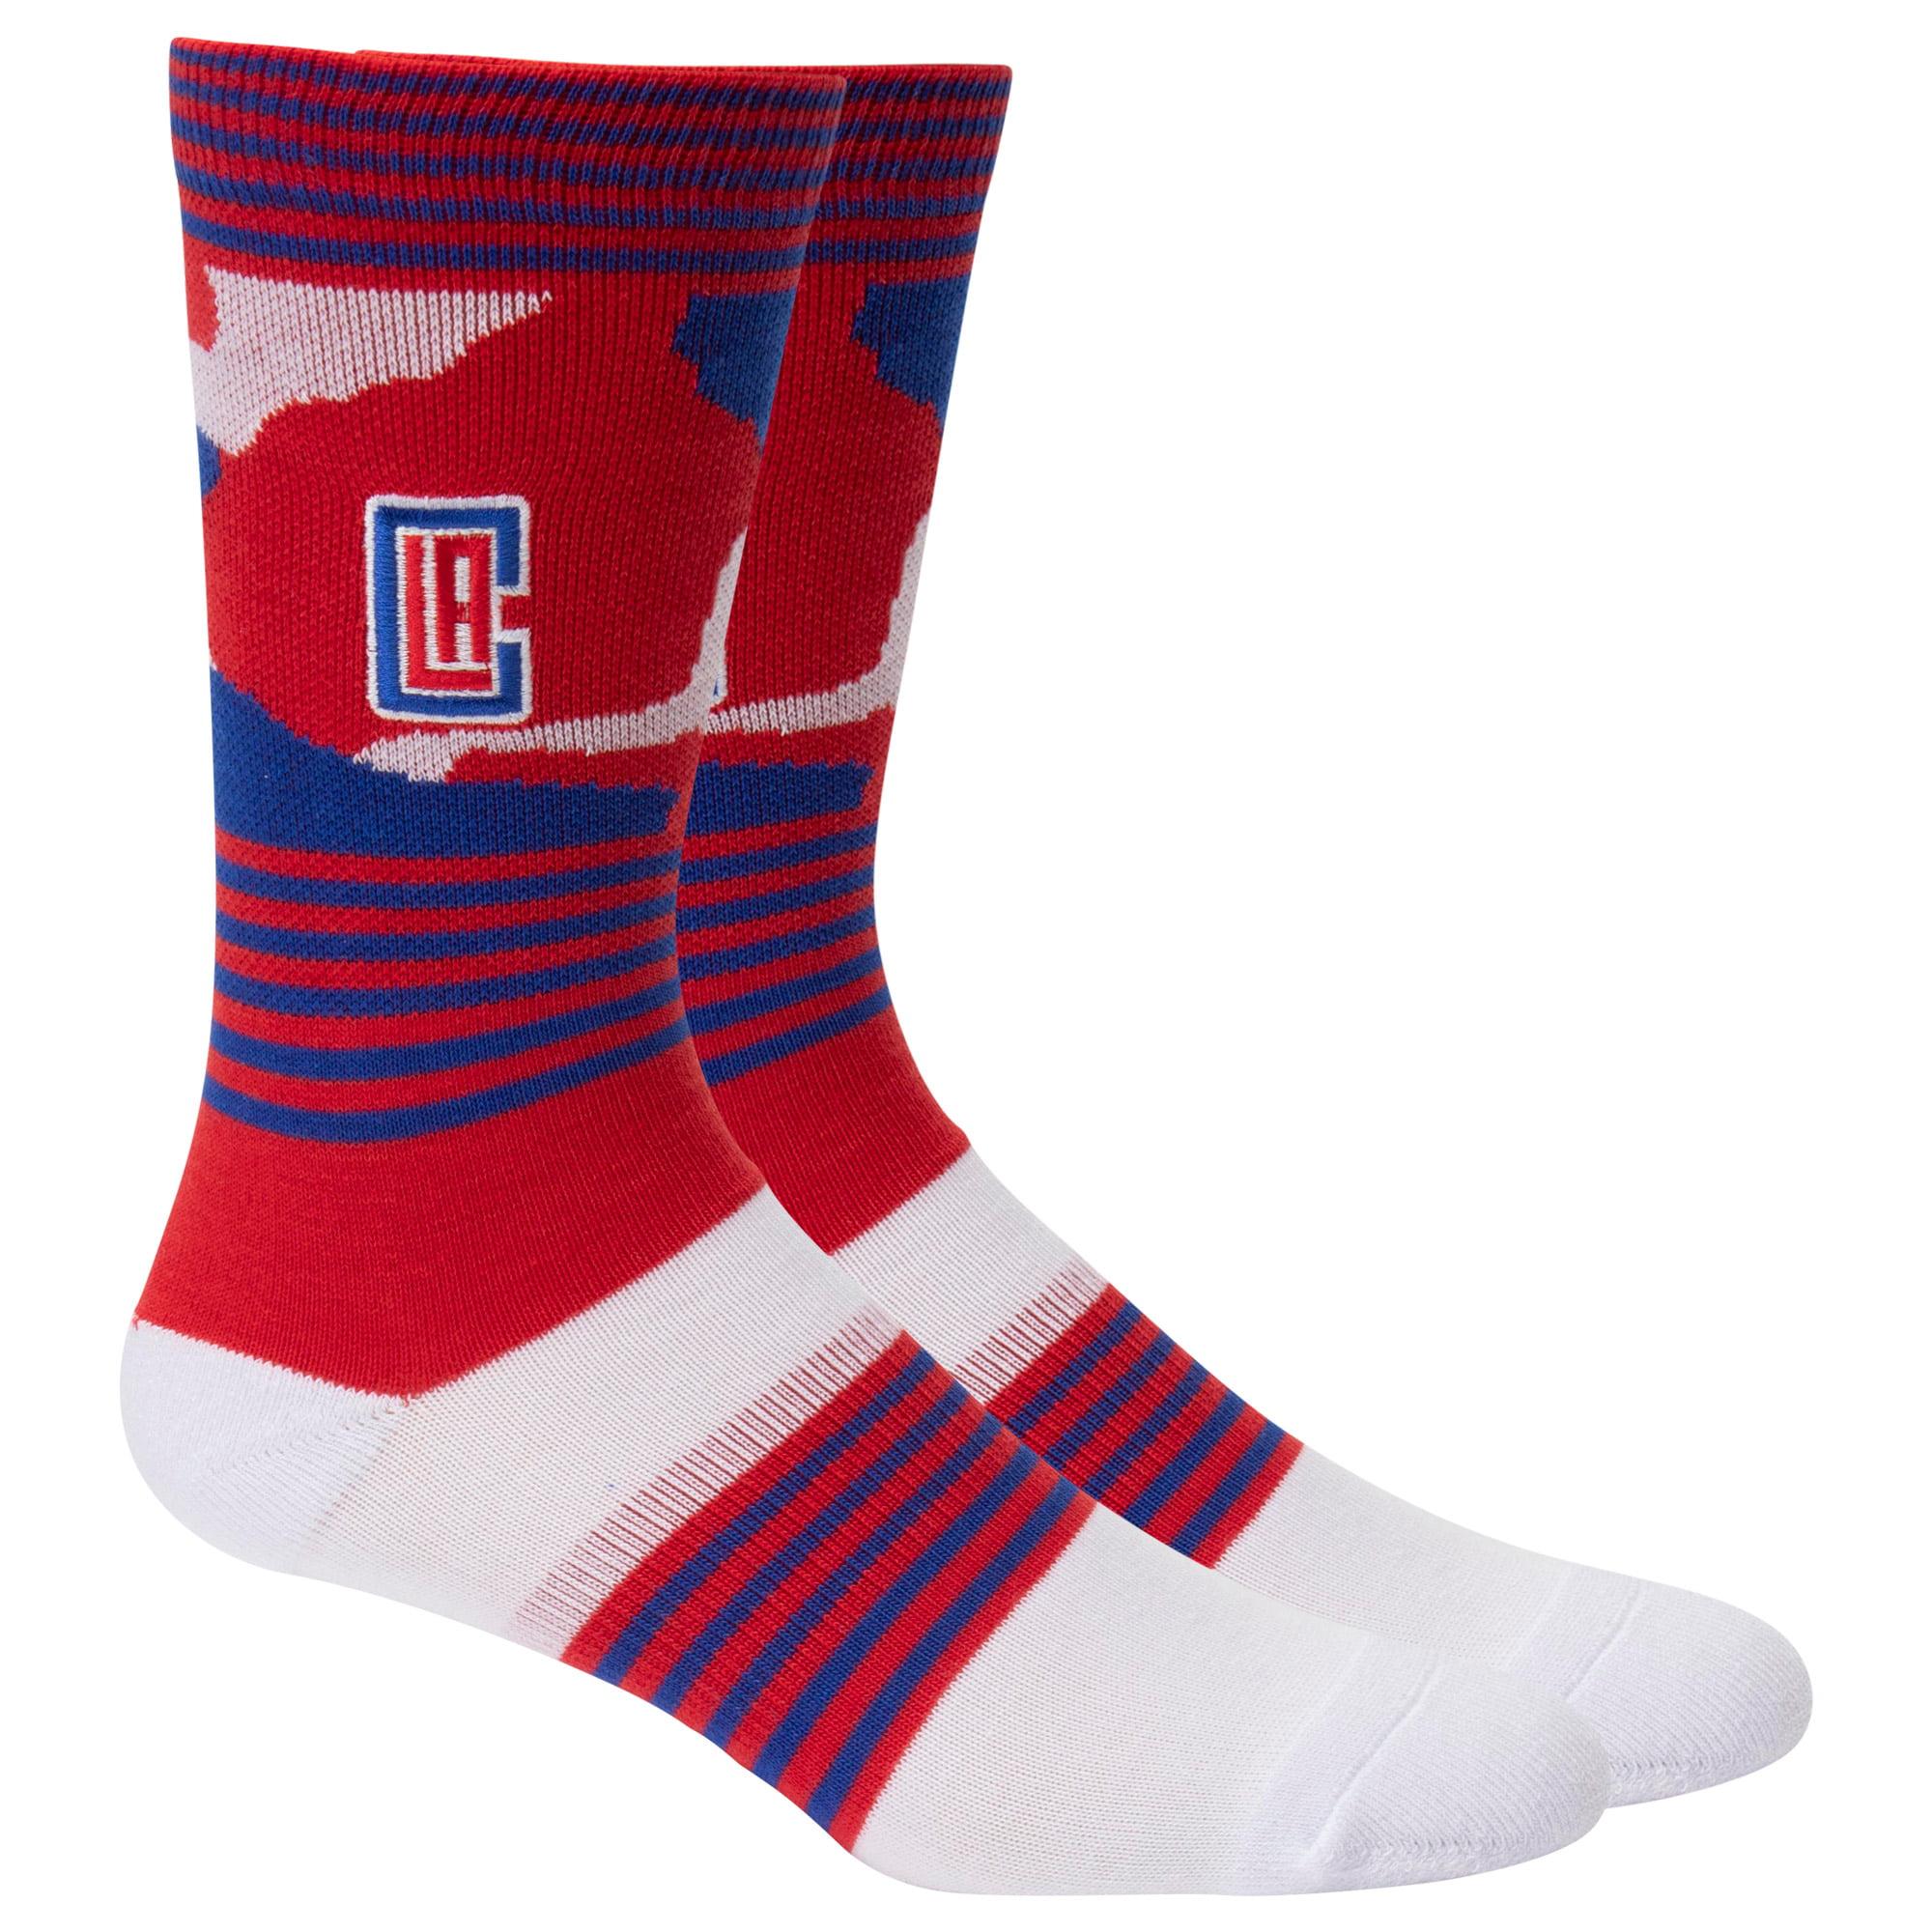 LA Clippers Camo Crew Socks - L